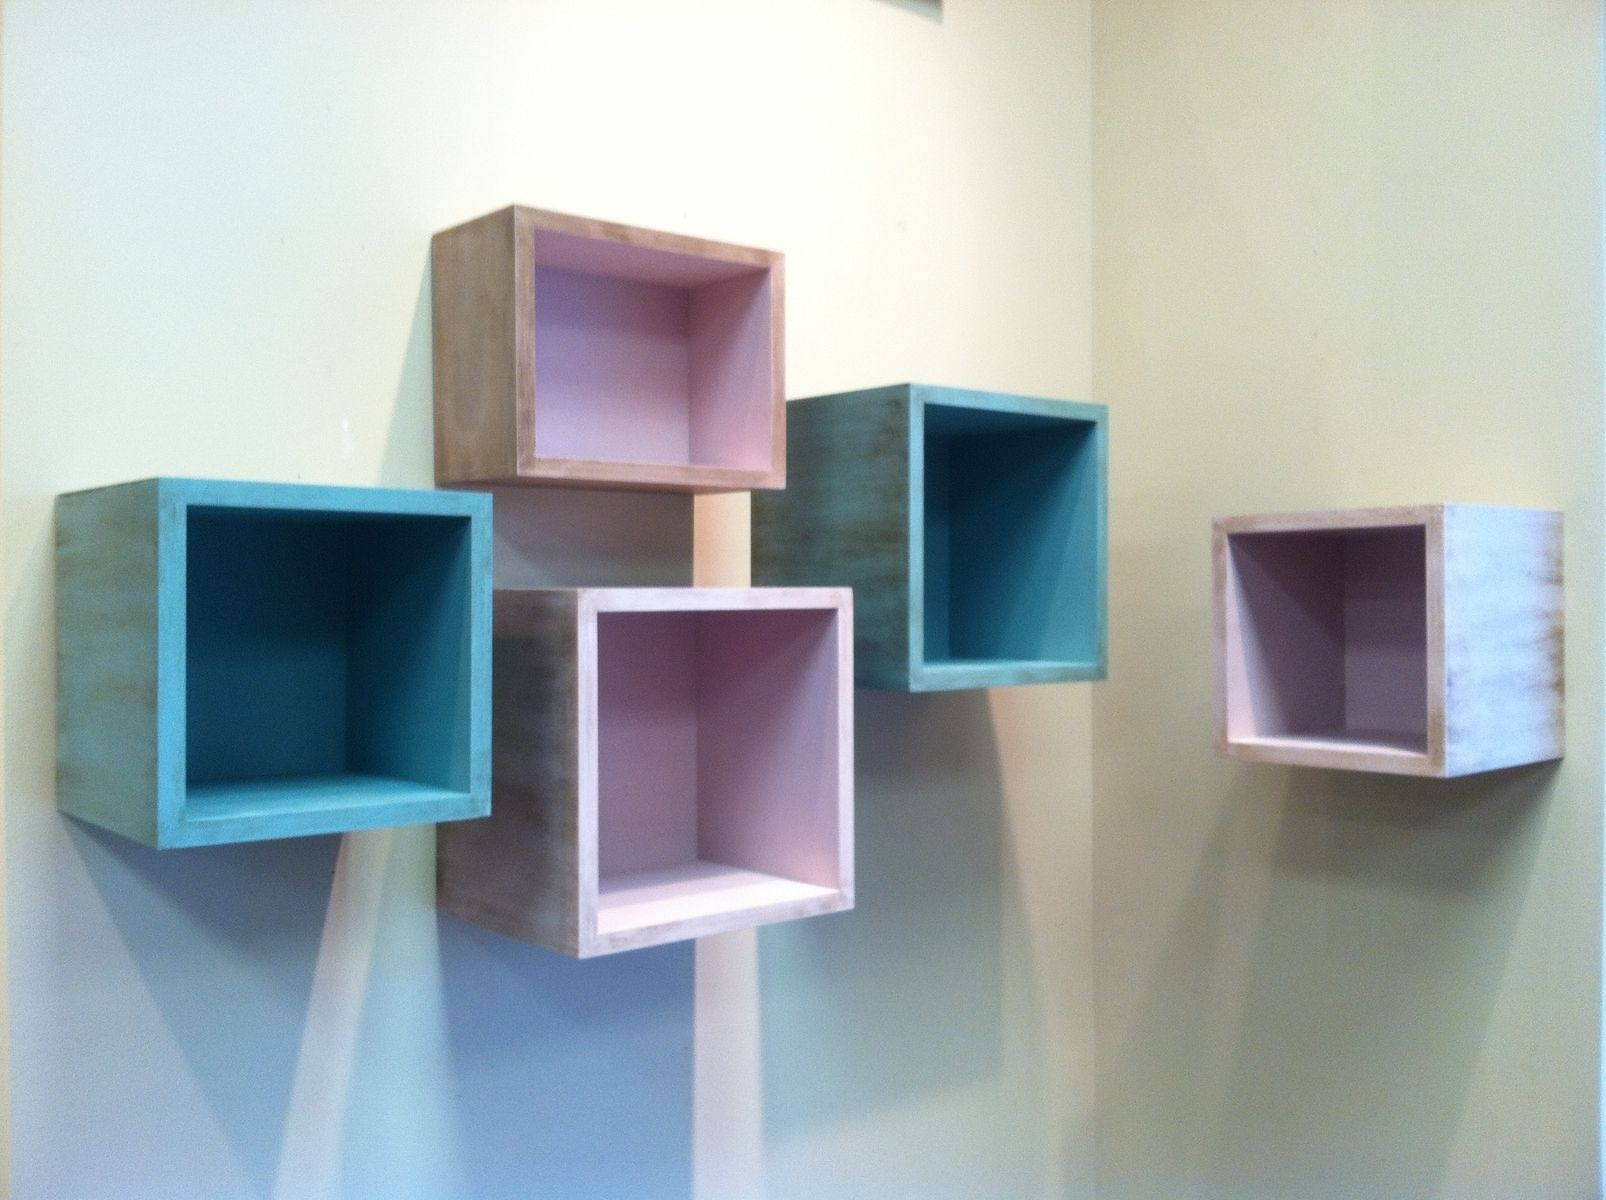 furniture delightful shelving unit design inspiration stylish floating box shelves ikea beautiful cube shaped shelf wonderful chalk paint wax finish creative secret compartment